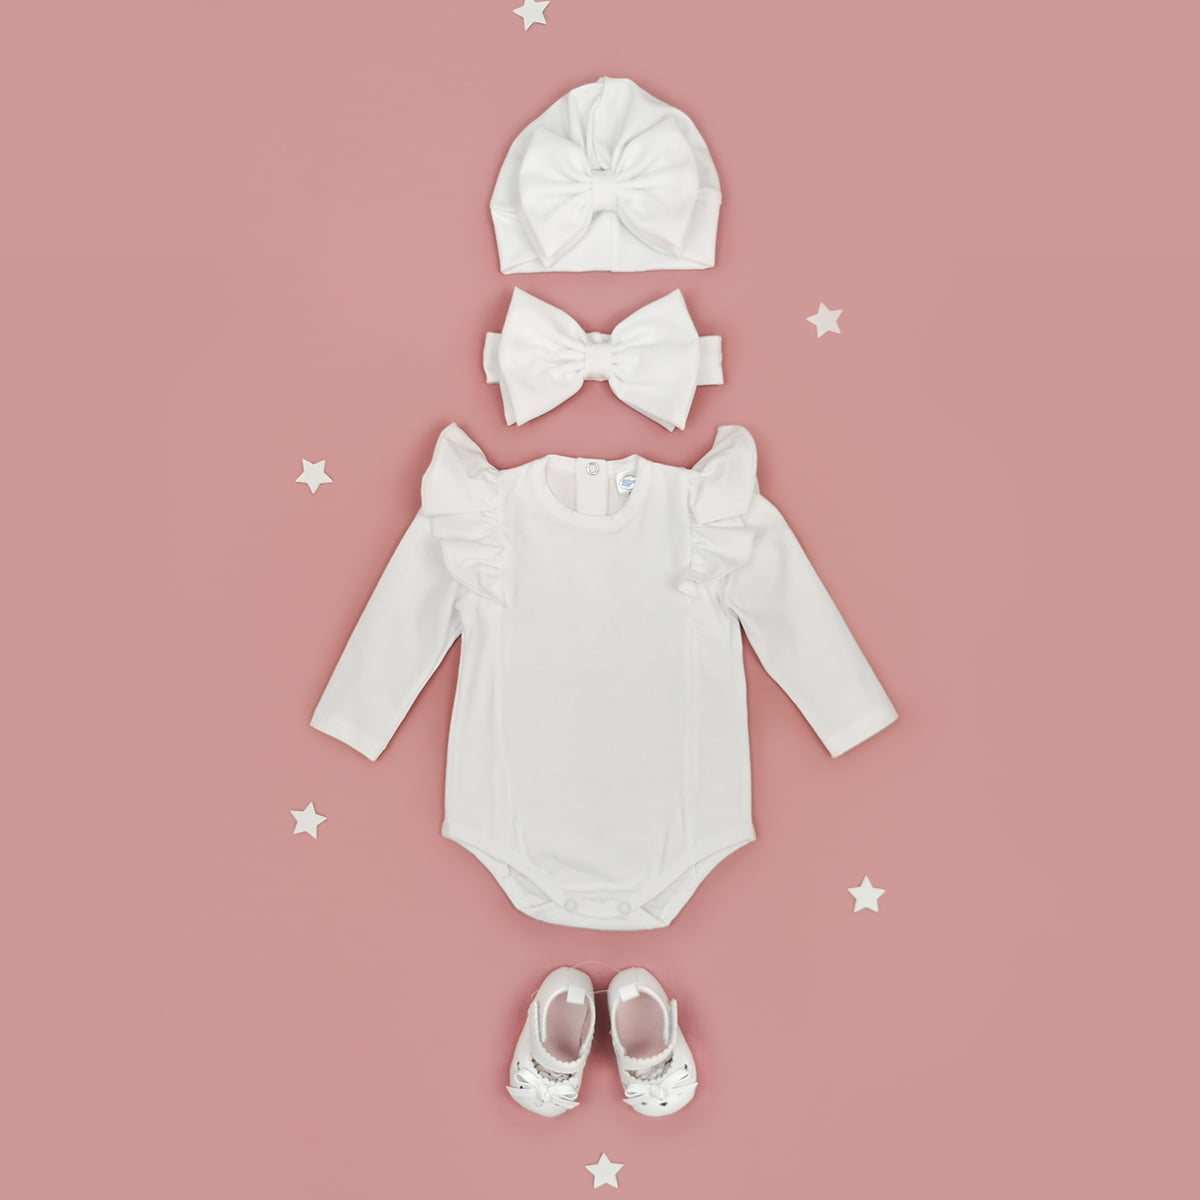 bijeli komplet bella za bebe